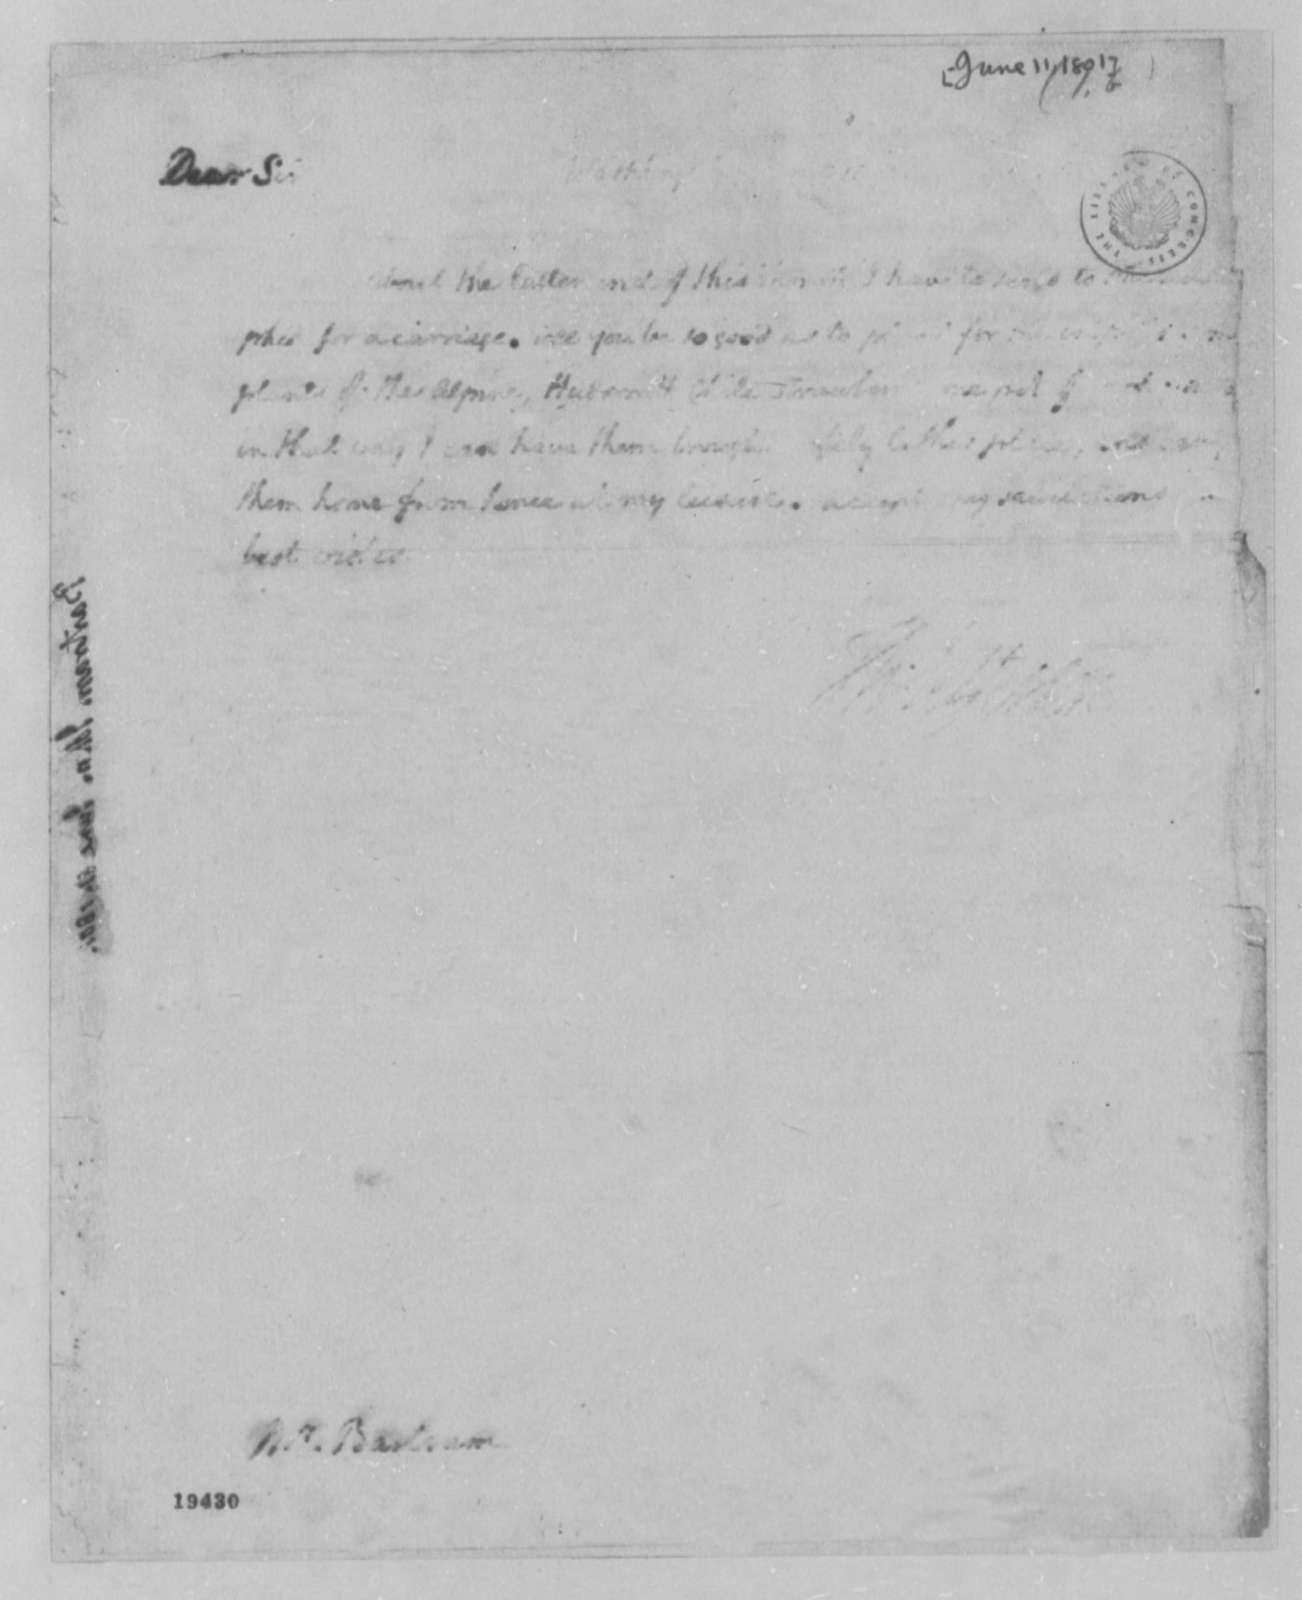 Thomas Jefferson to John Bartram, June 11, 1801